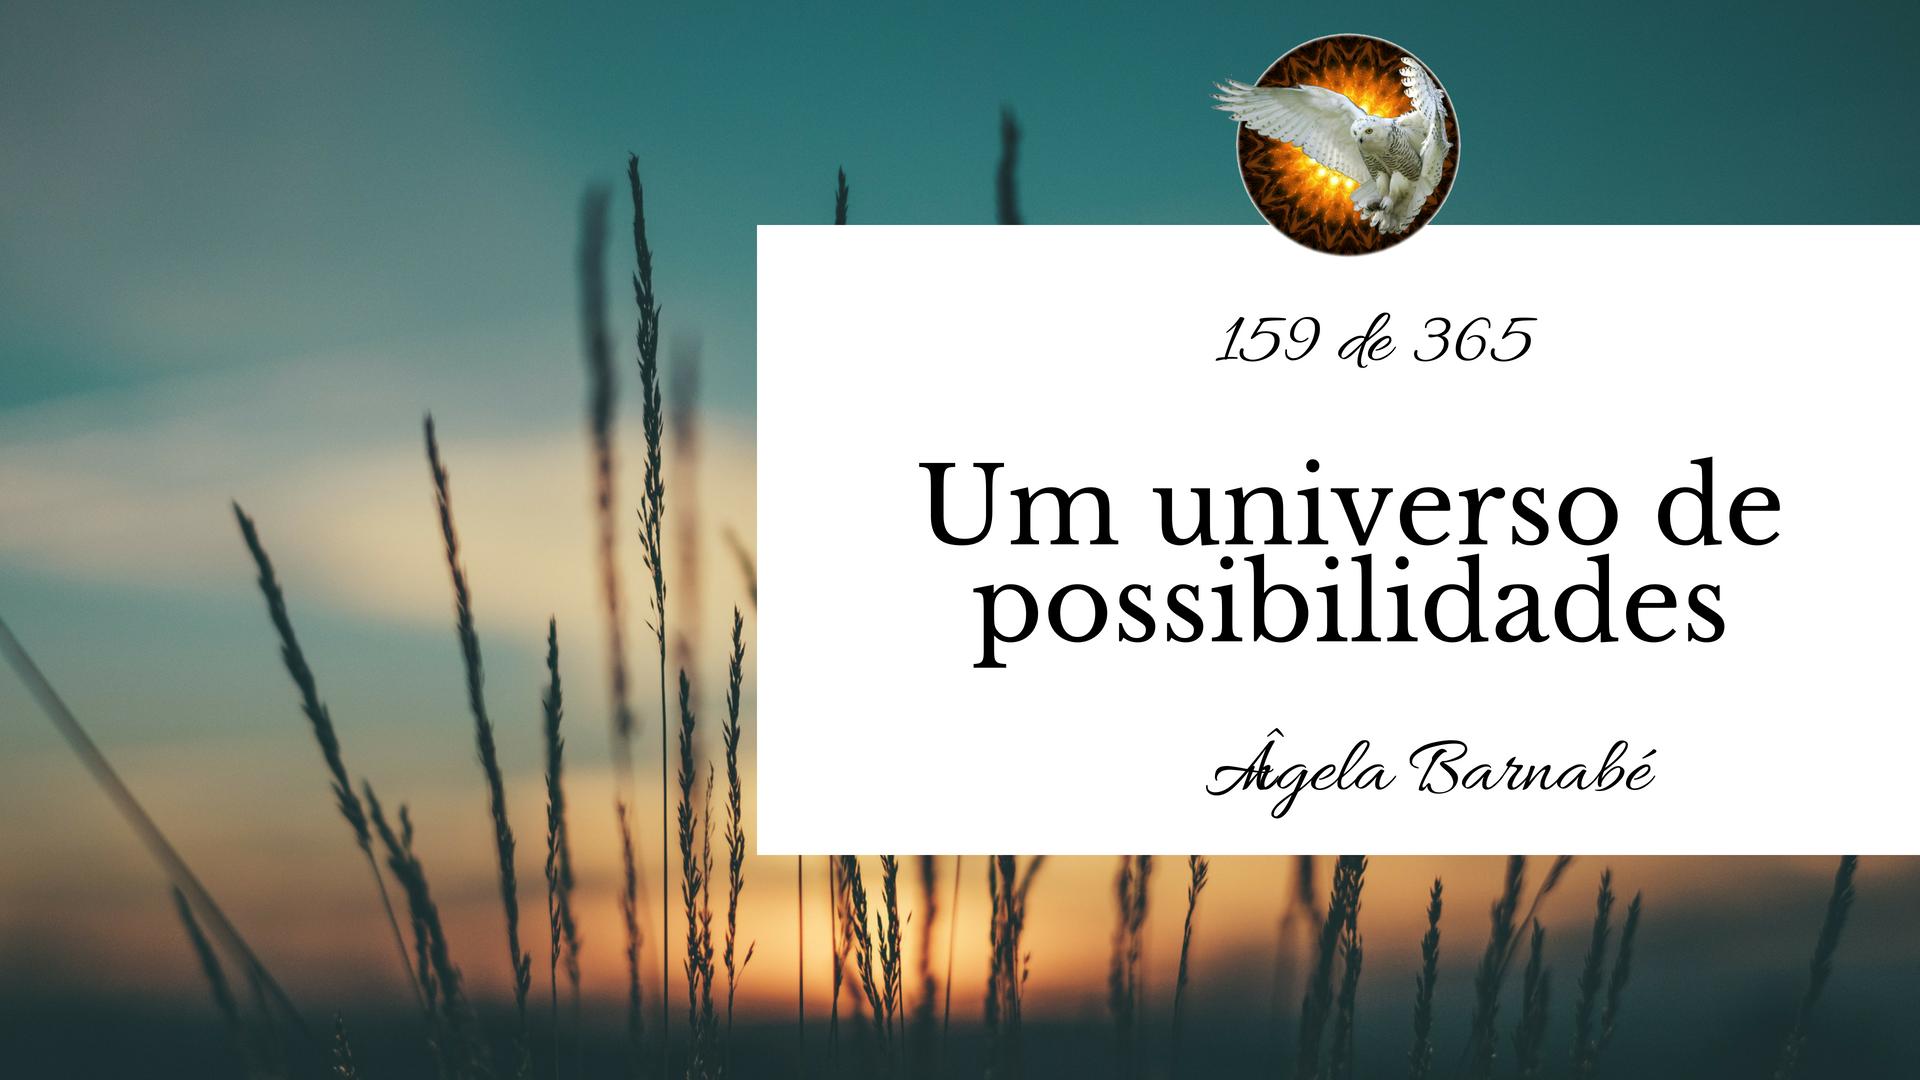 universo de possibilidades